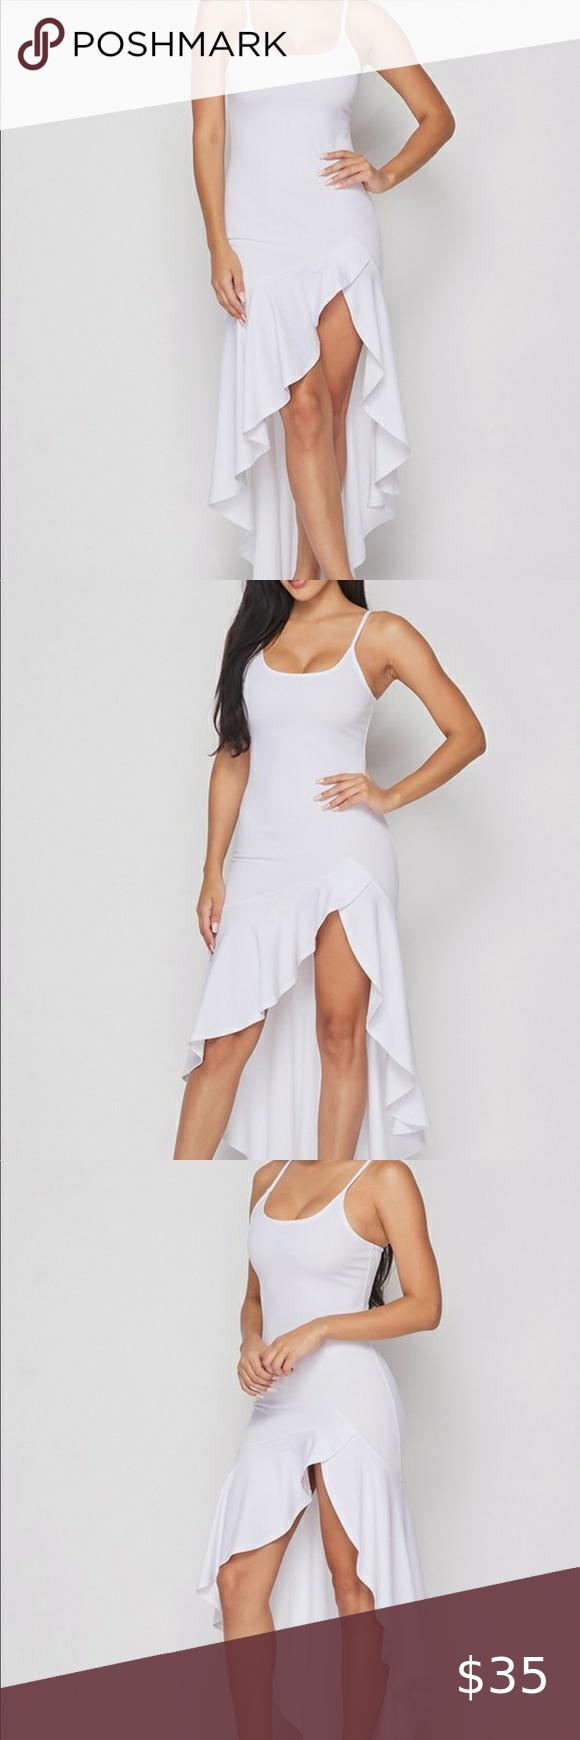 White Spaghetti Strap Maxi Ruffle Stretchy Dress Stretchy Dress Colorful Maxi Dress Ribbed Maxi Dress [ 1740 x 580 Pixel ]